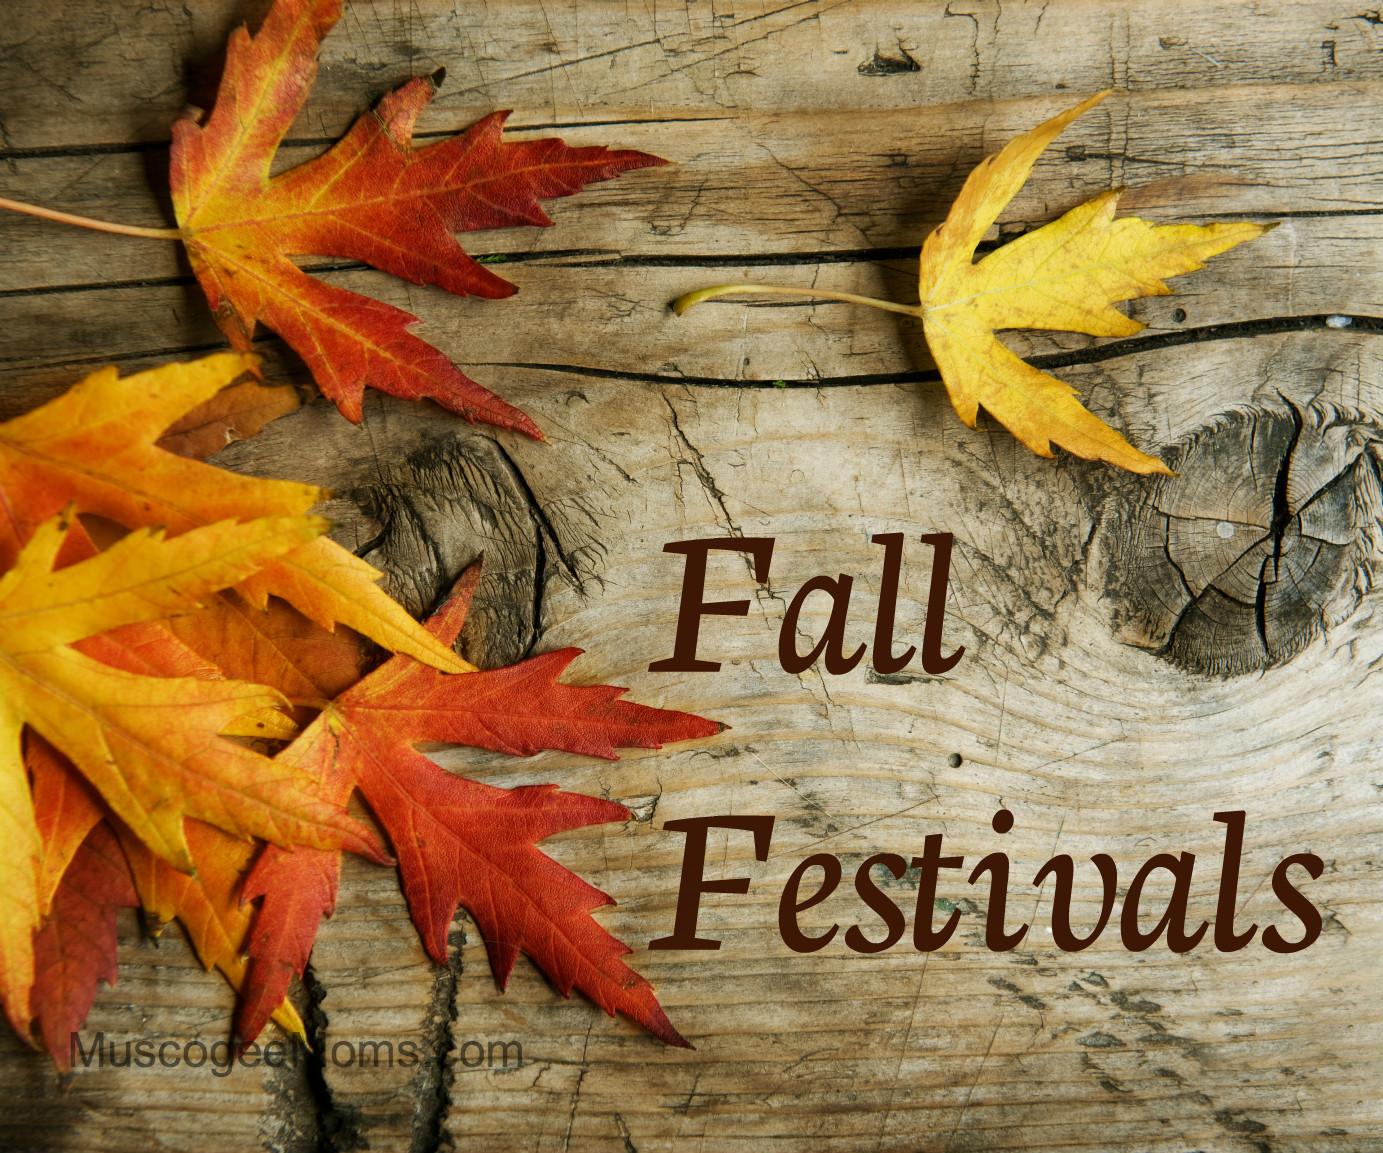 Fall Festivals Guide